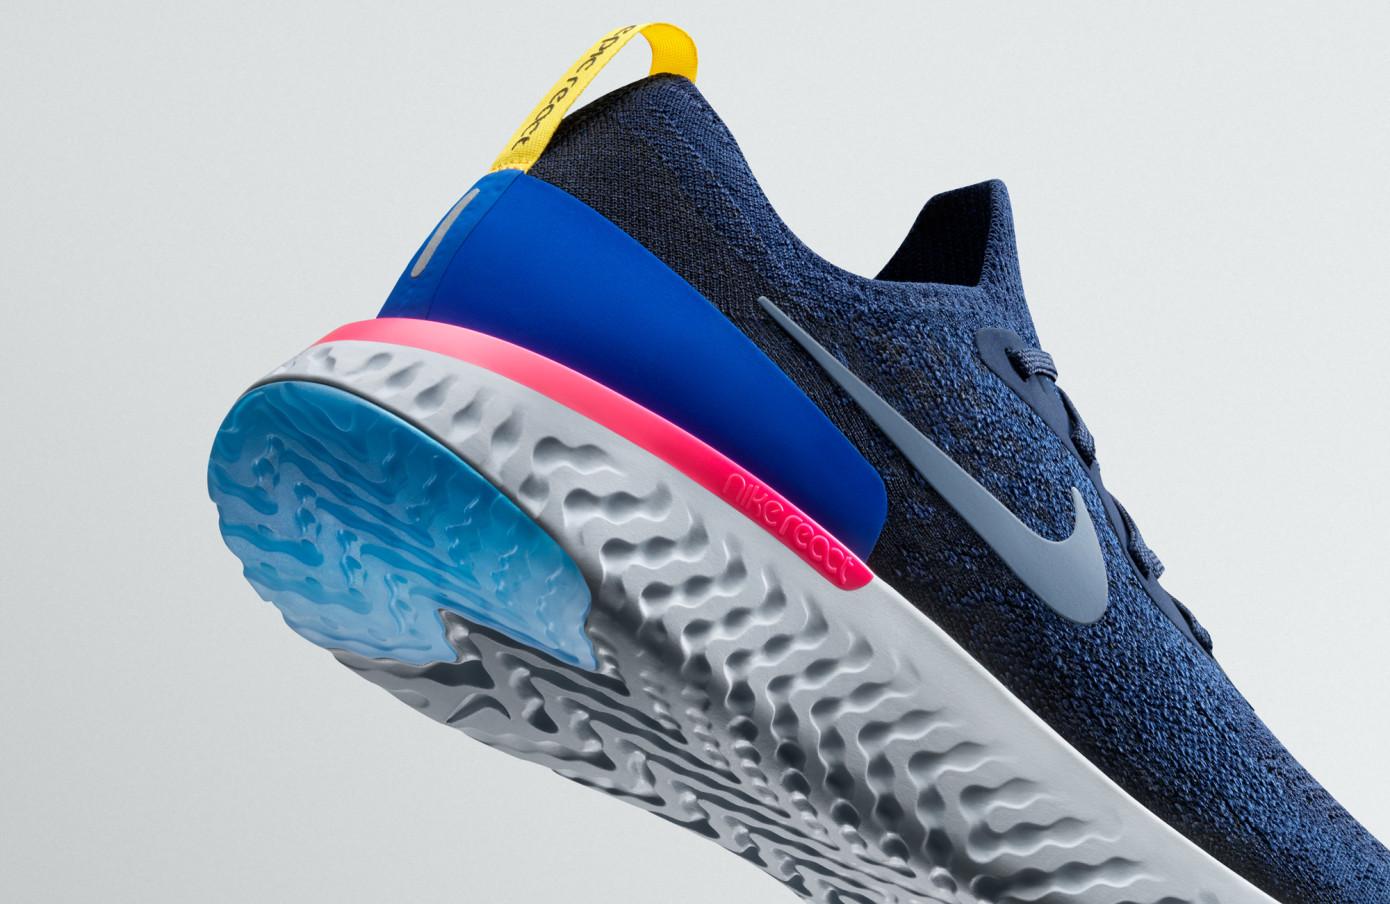 Nike-ը գնել է արհեստական բանականության միջոցով սպառողների ցանկությունները գուշակող ստարտափ